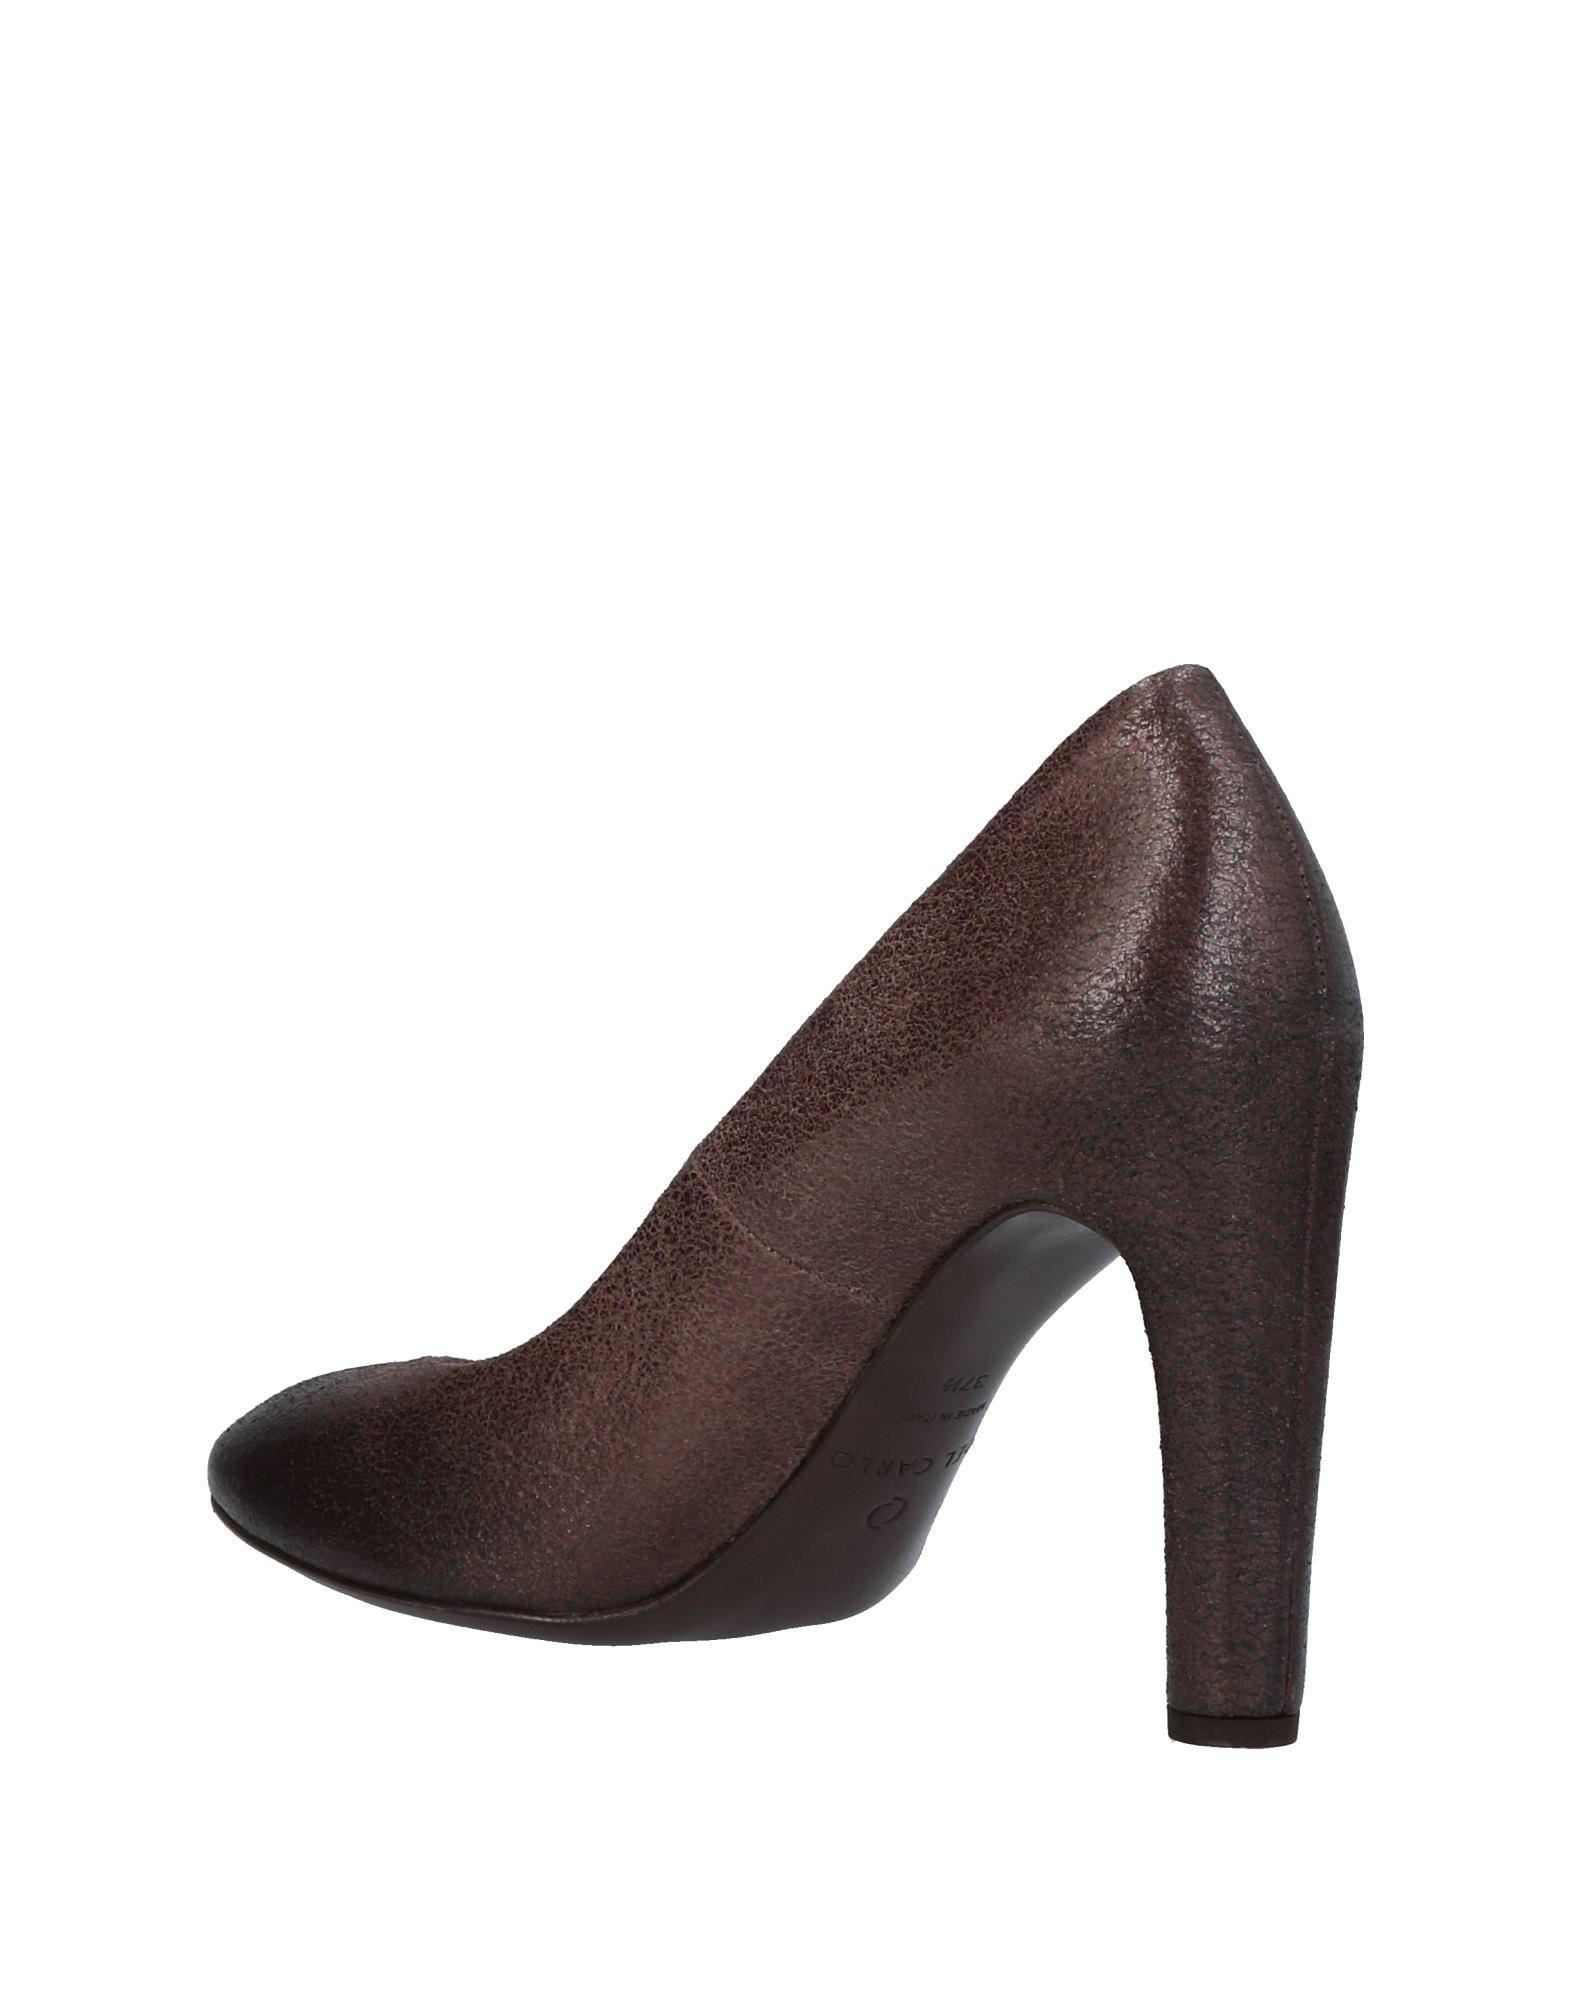 Gut Carlo um billige Schuhe zu tragenDel Carlo Gut Pumps Damen  11425949OT 397d2a